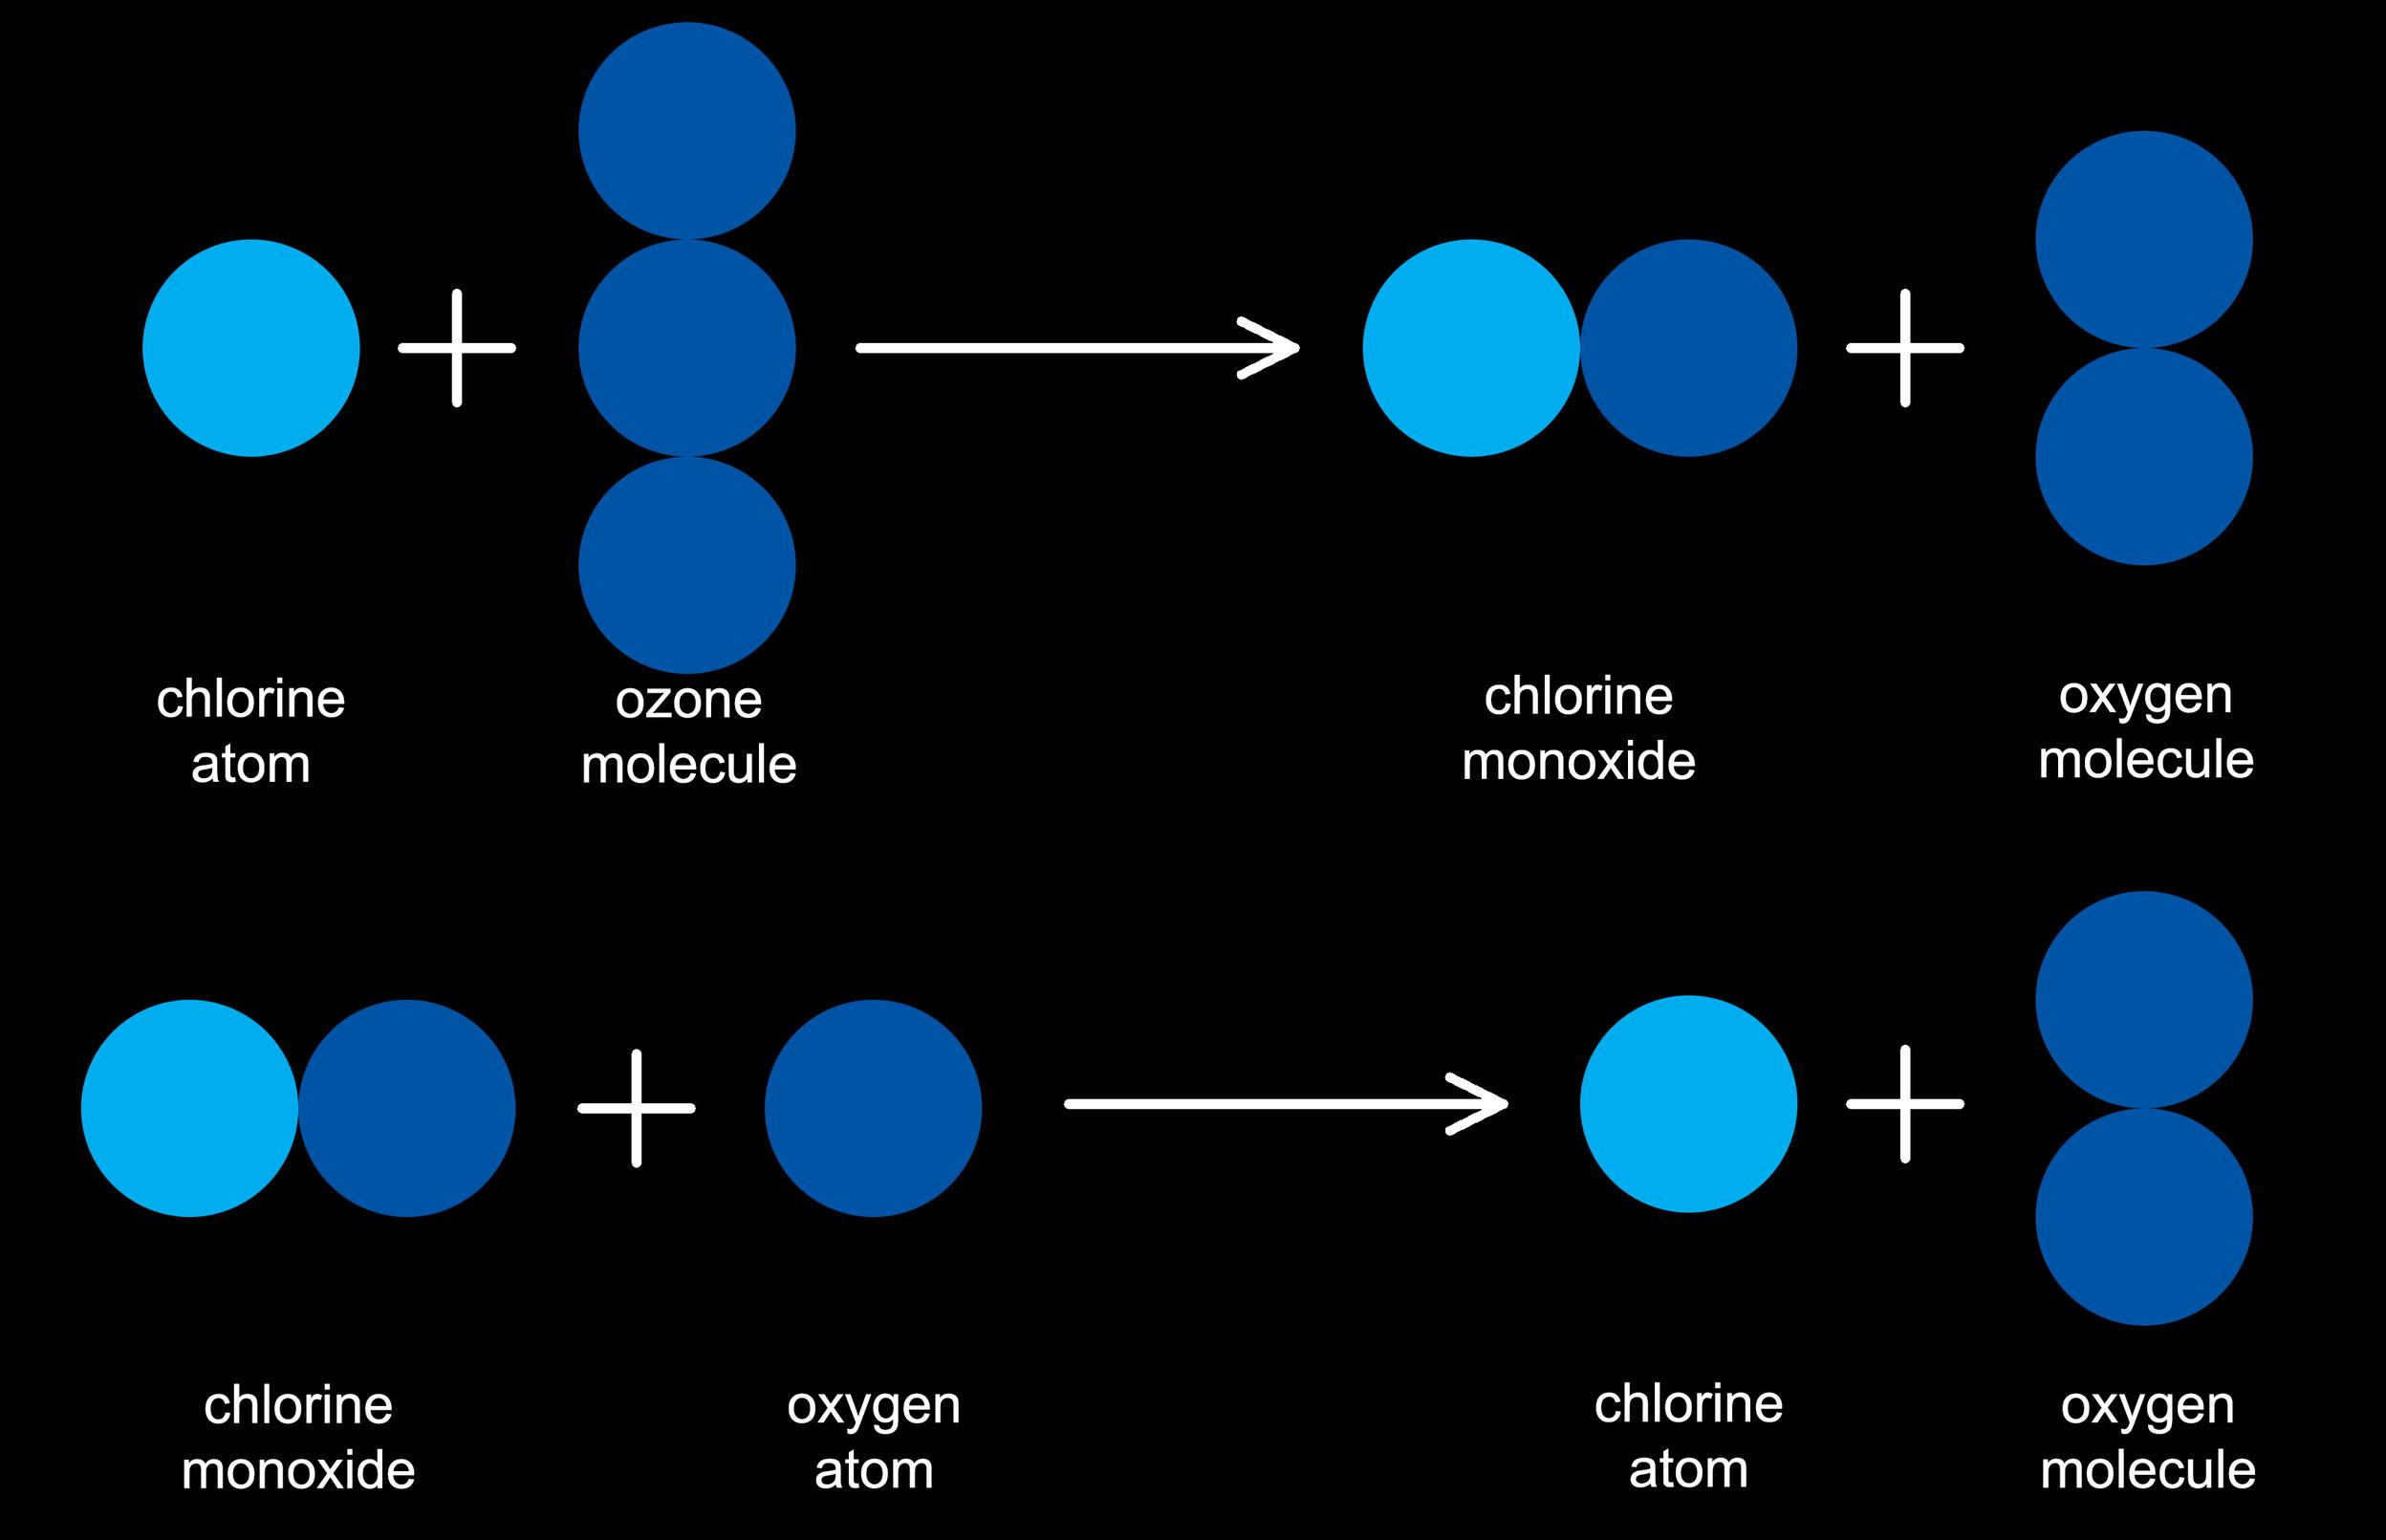 ozone destruction catalyzed by chlorine